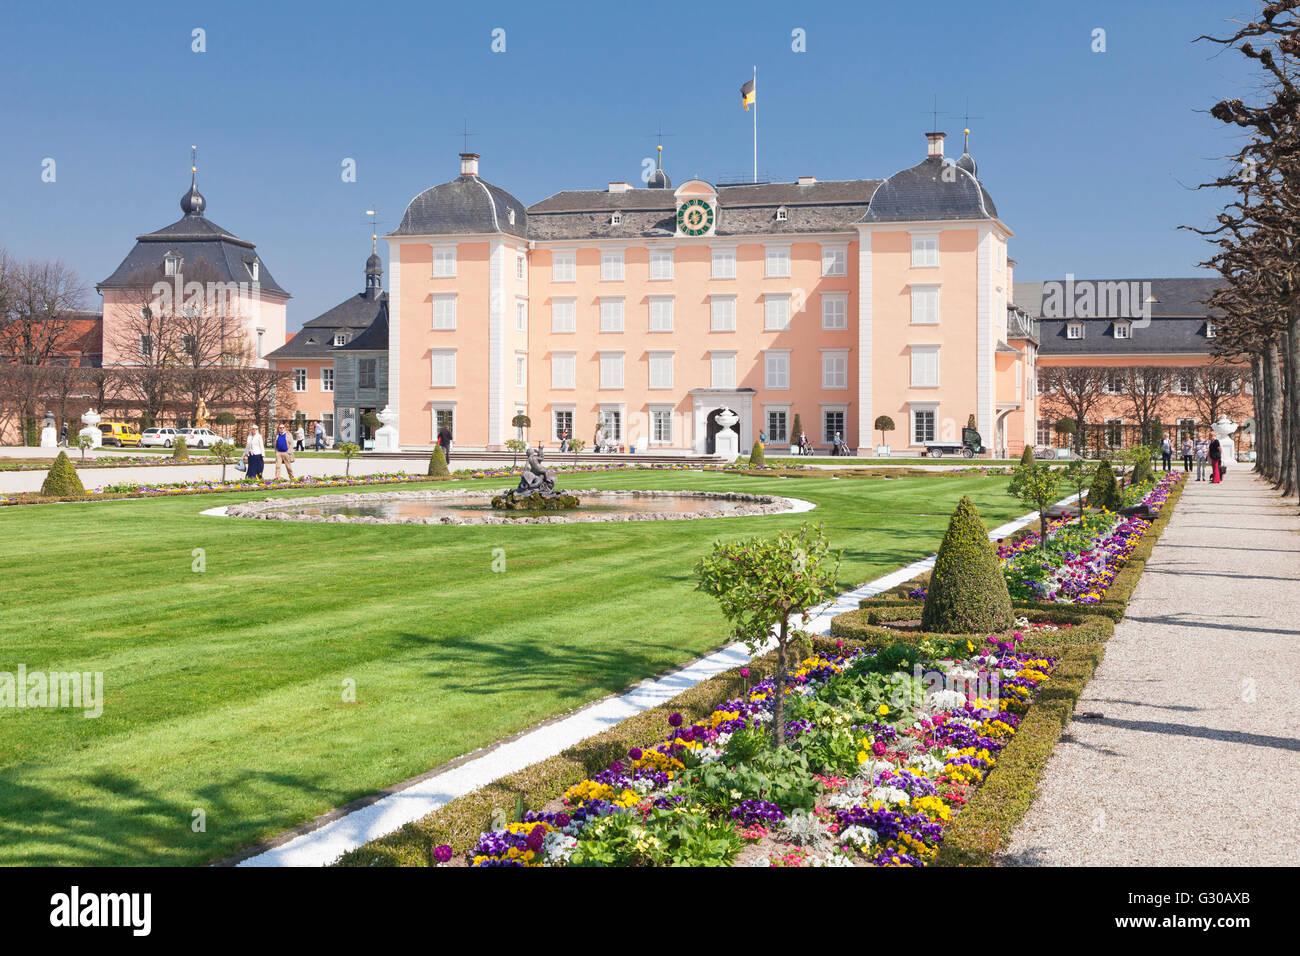 Schloss Schwetzingen Palace, Baroque Garden, Schwetzingen, Baden-Wurttemberg, Germany, Europe - Stock Image